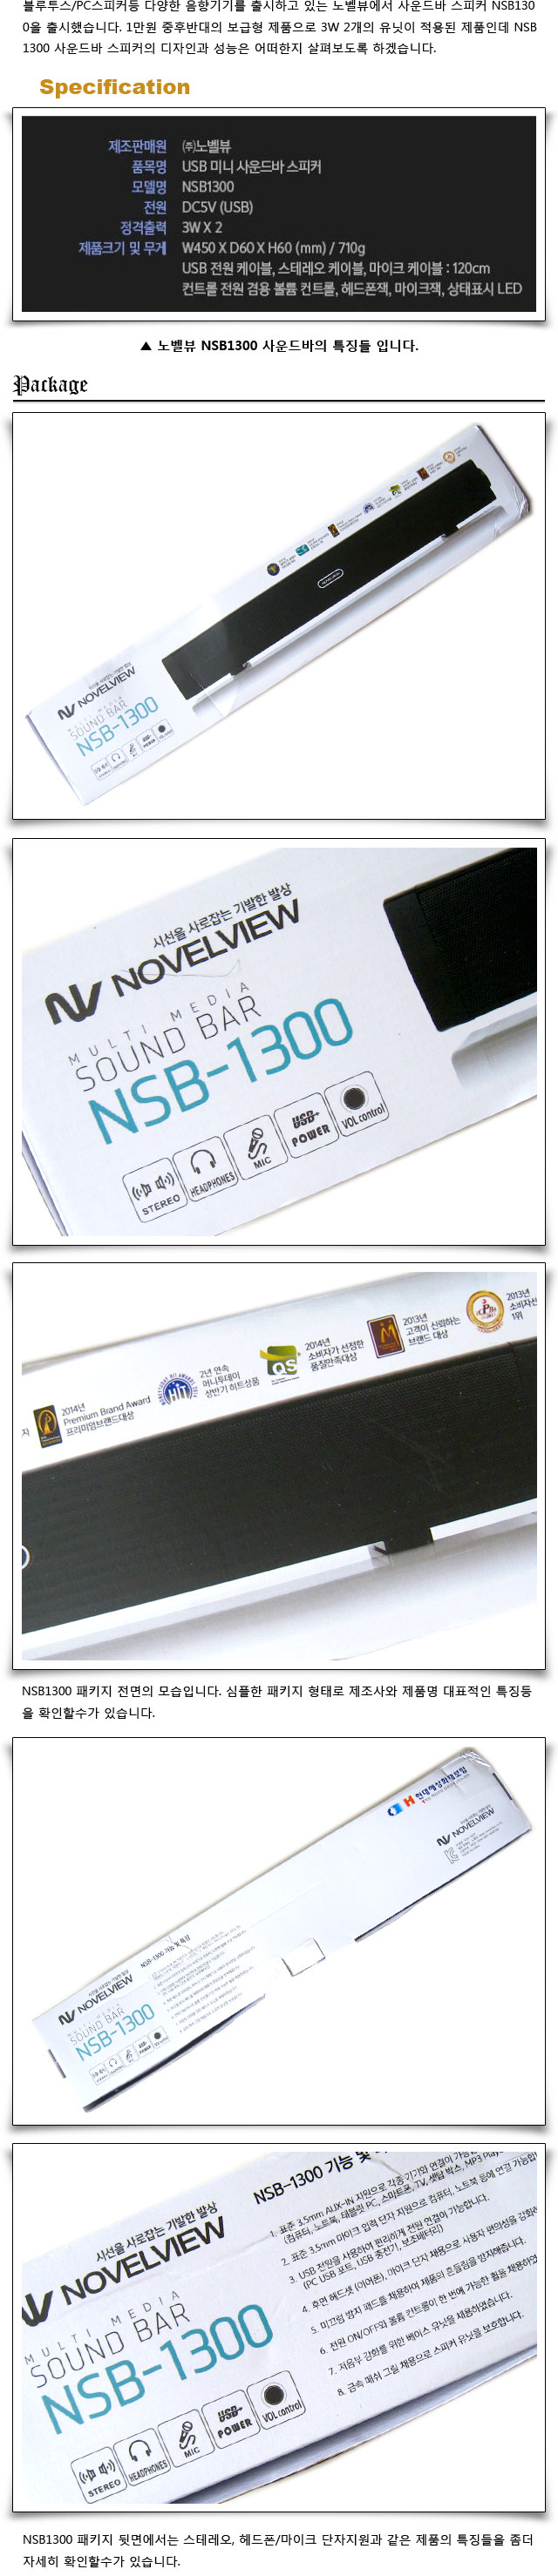 NSB1300_03.jpg